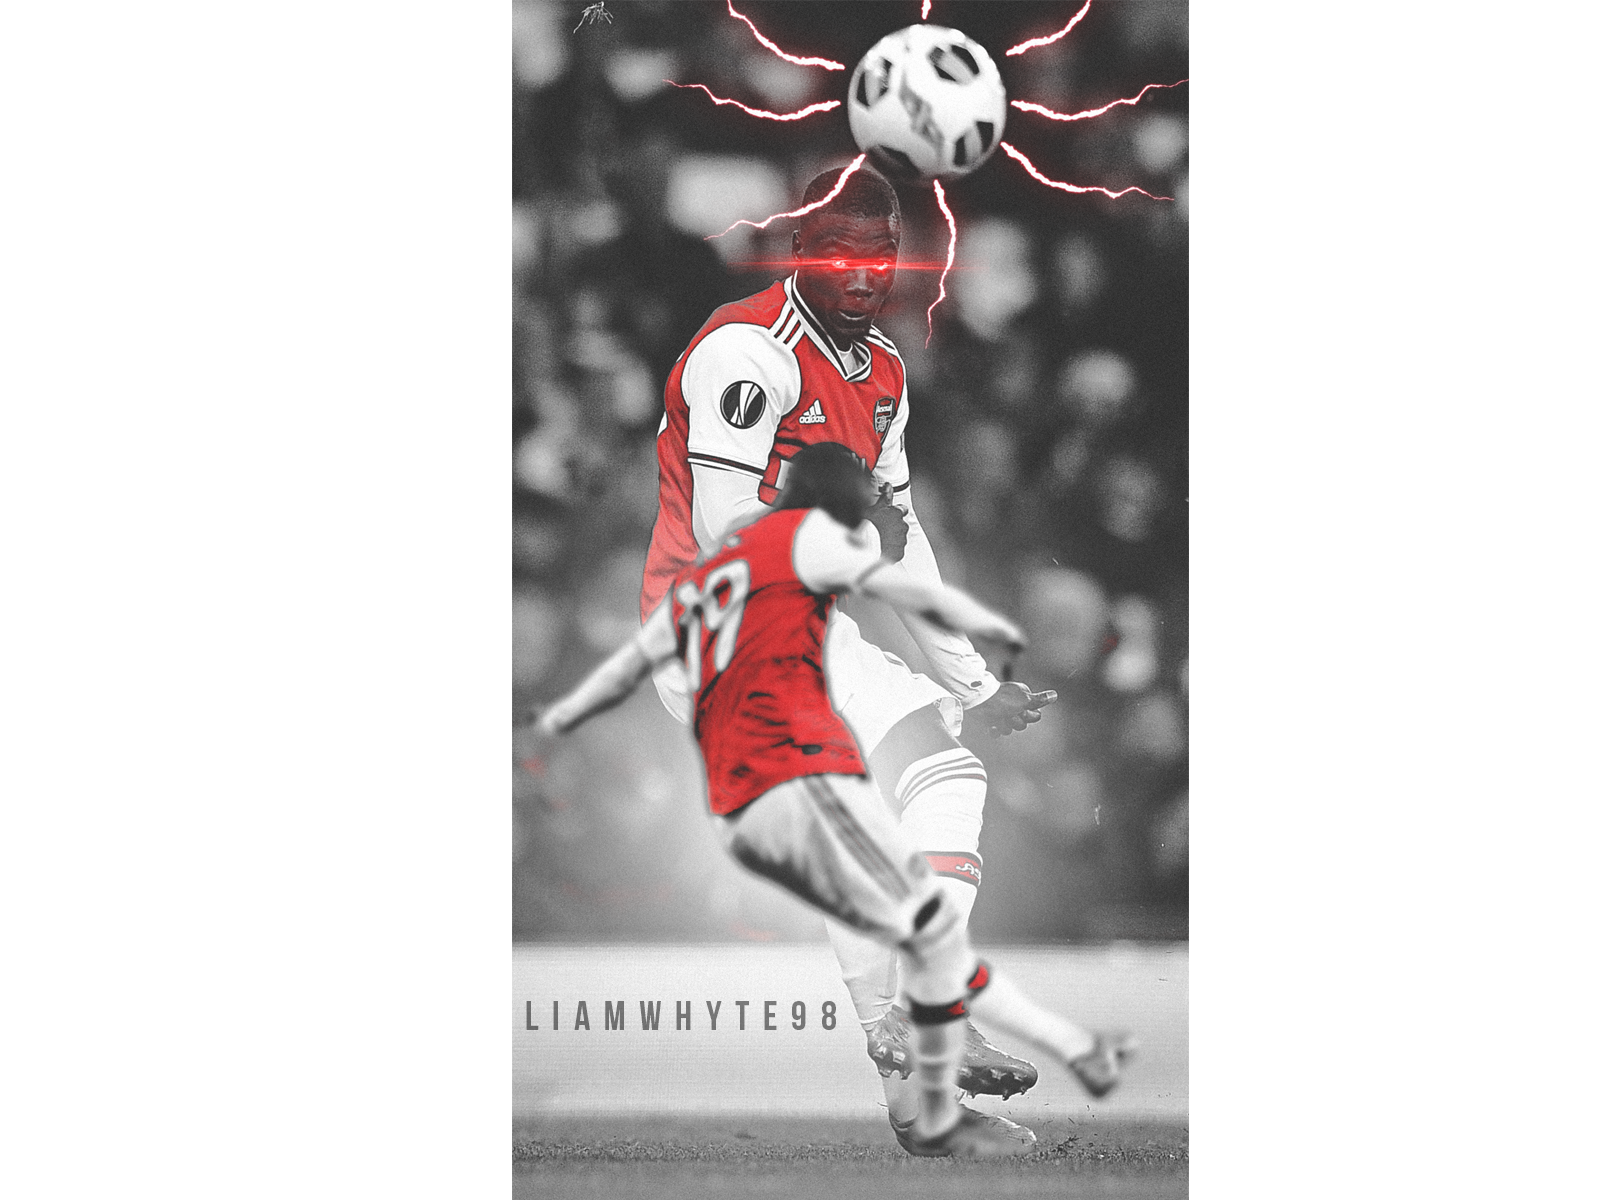 Arsenal S Free Kick Savoir Lionel Messi Edit Fifa 20 Nicolas Pepe Wallpaper 2020 1600x1200 Download Hd Wallpaper Wallpapertip